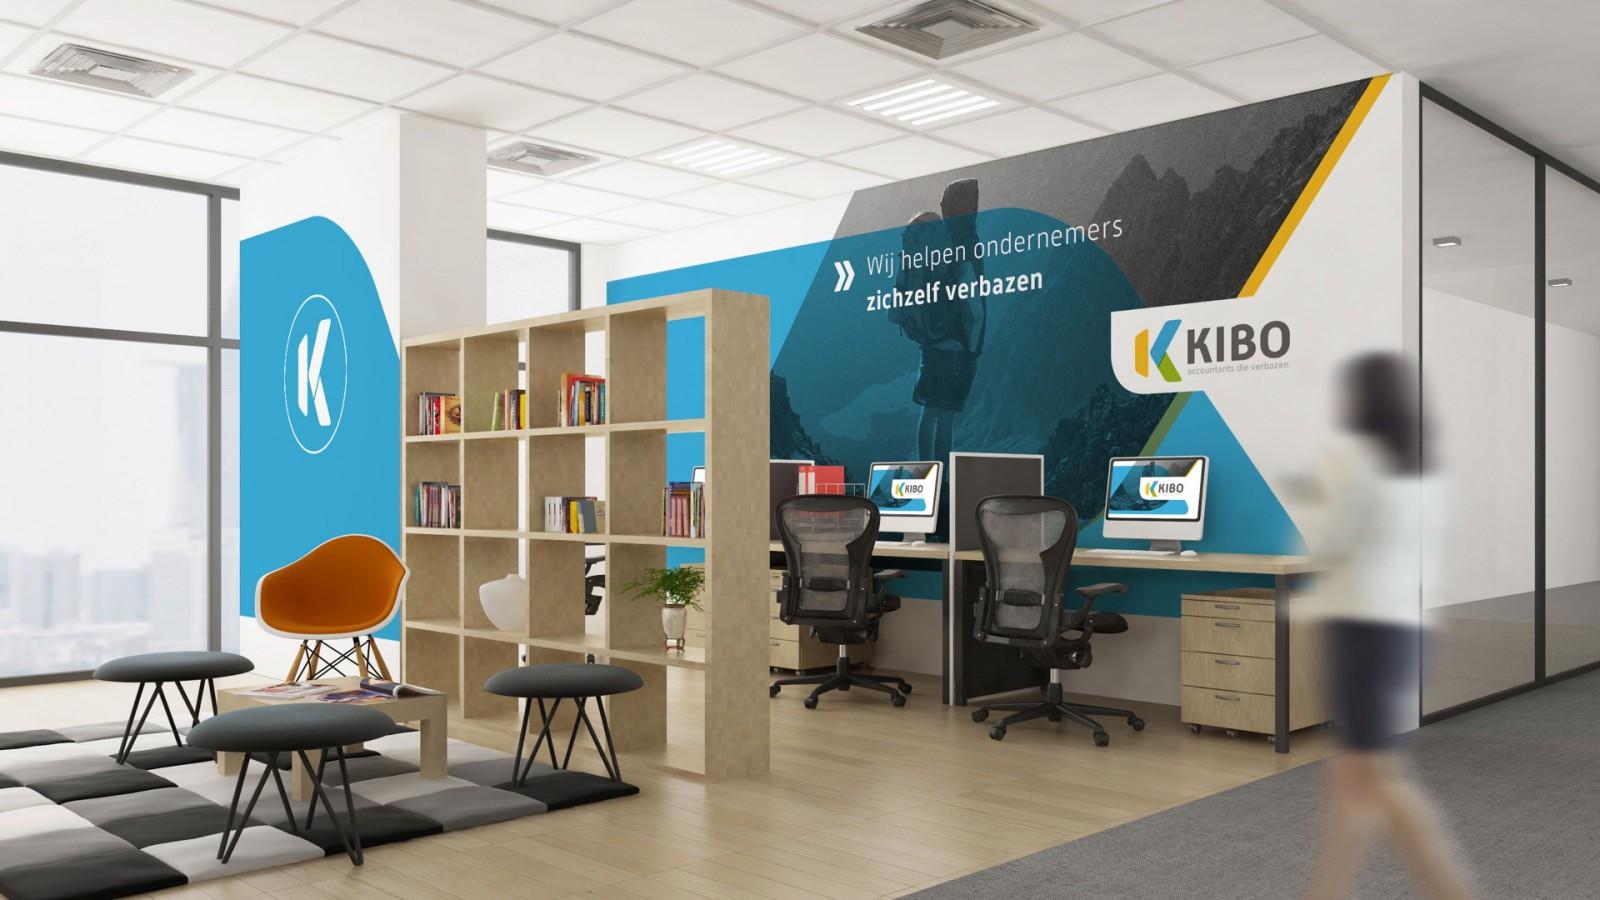 Kibo merkconcept kantoor